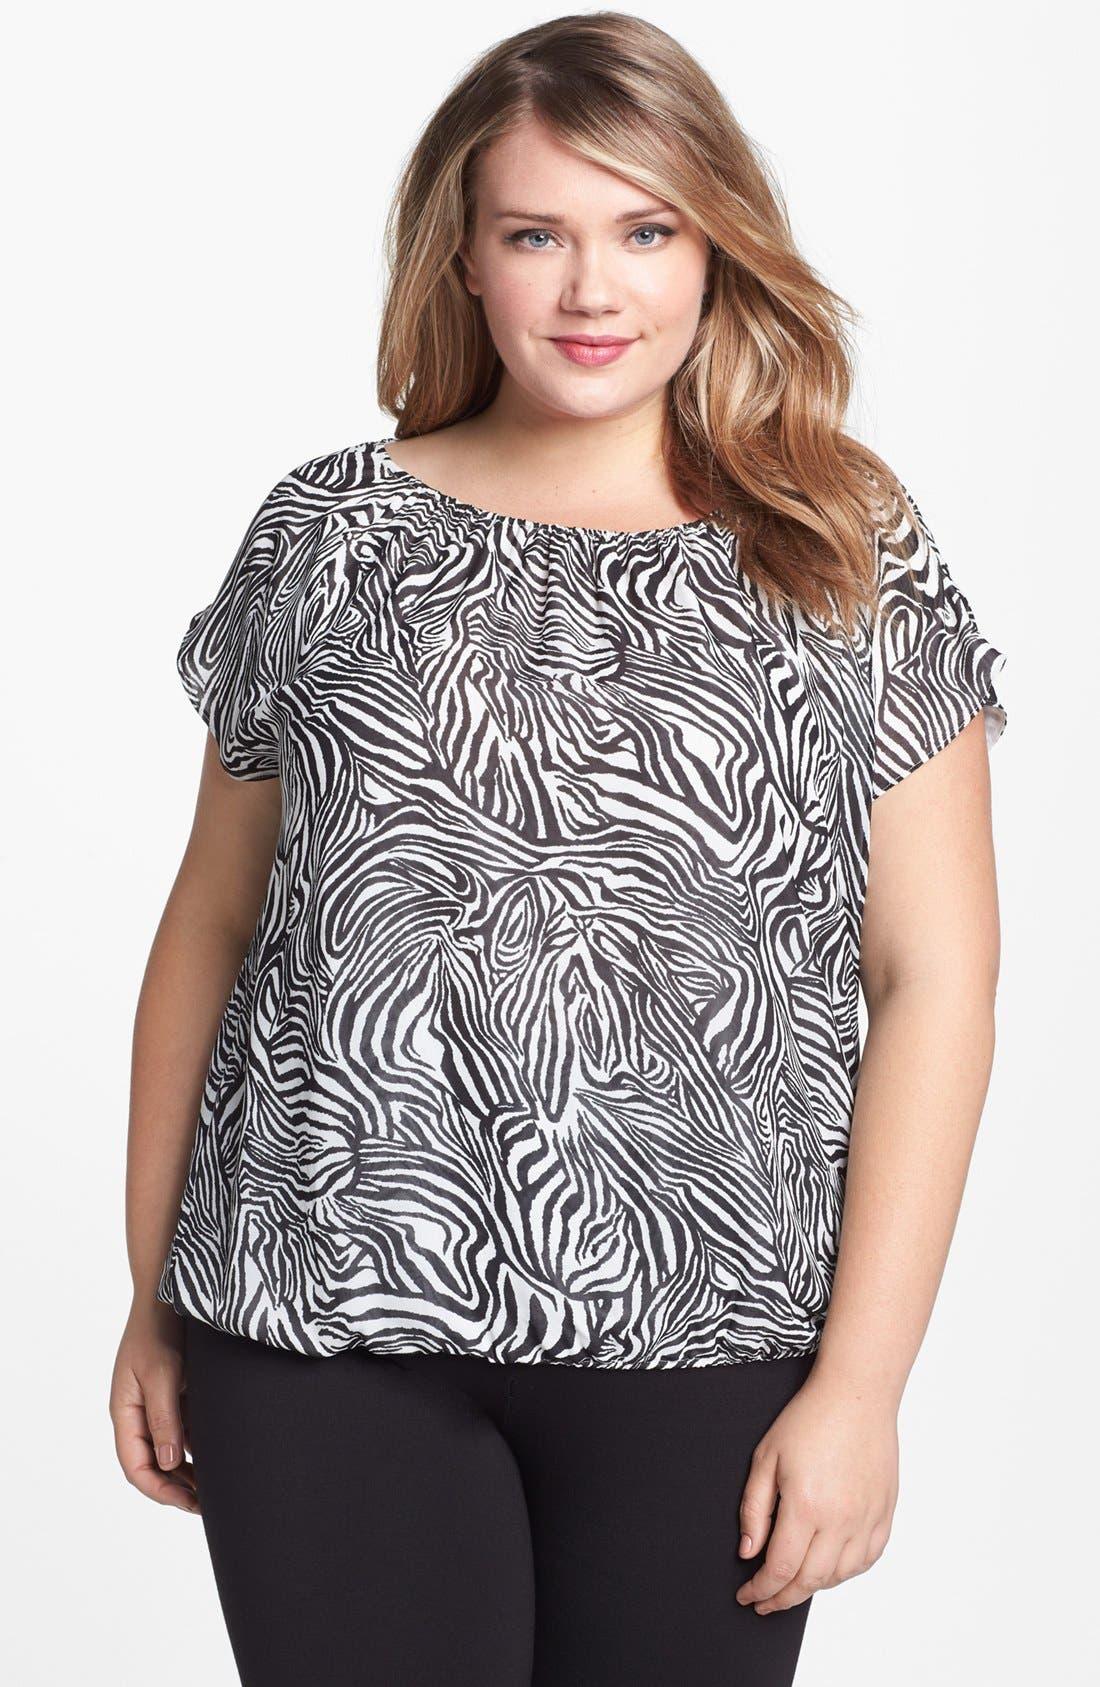 Alternate Image 1 Selected - Vince Camuto Zebra Print Blouse (Plus Size)